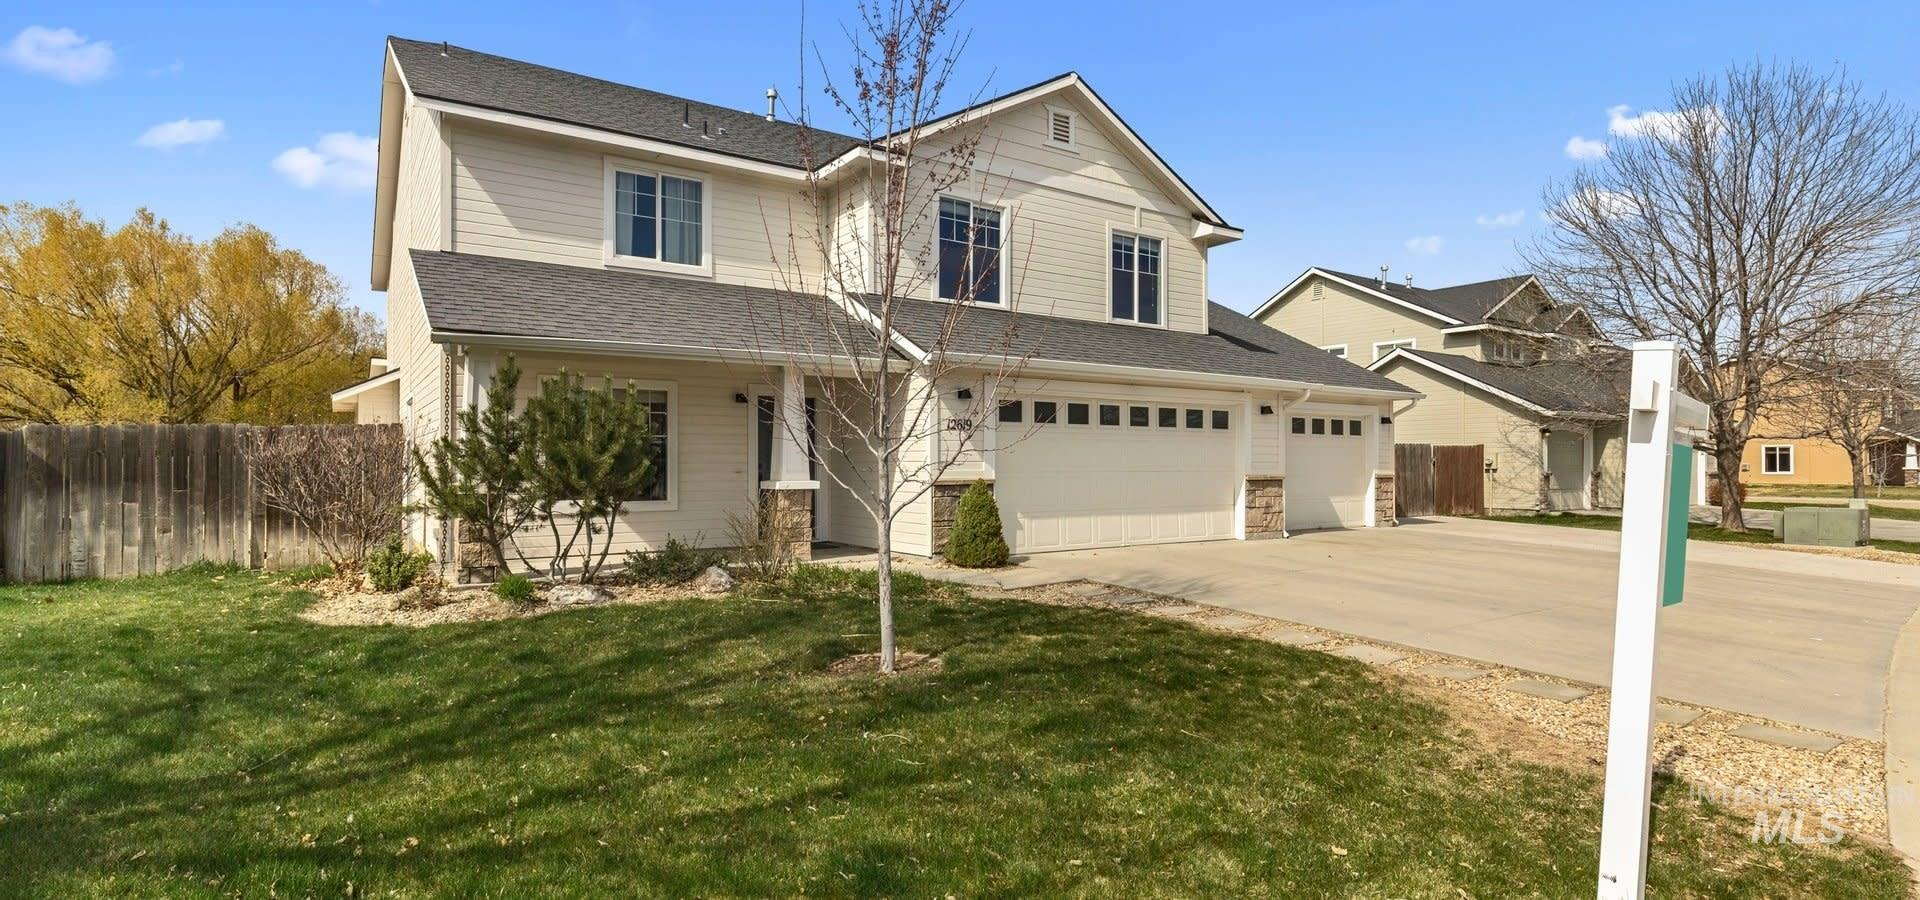 12619 W Horsham Property Photo - Boise, ID real estate listing